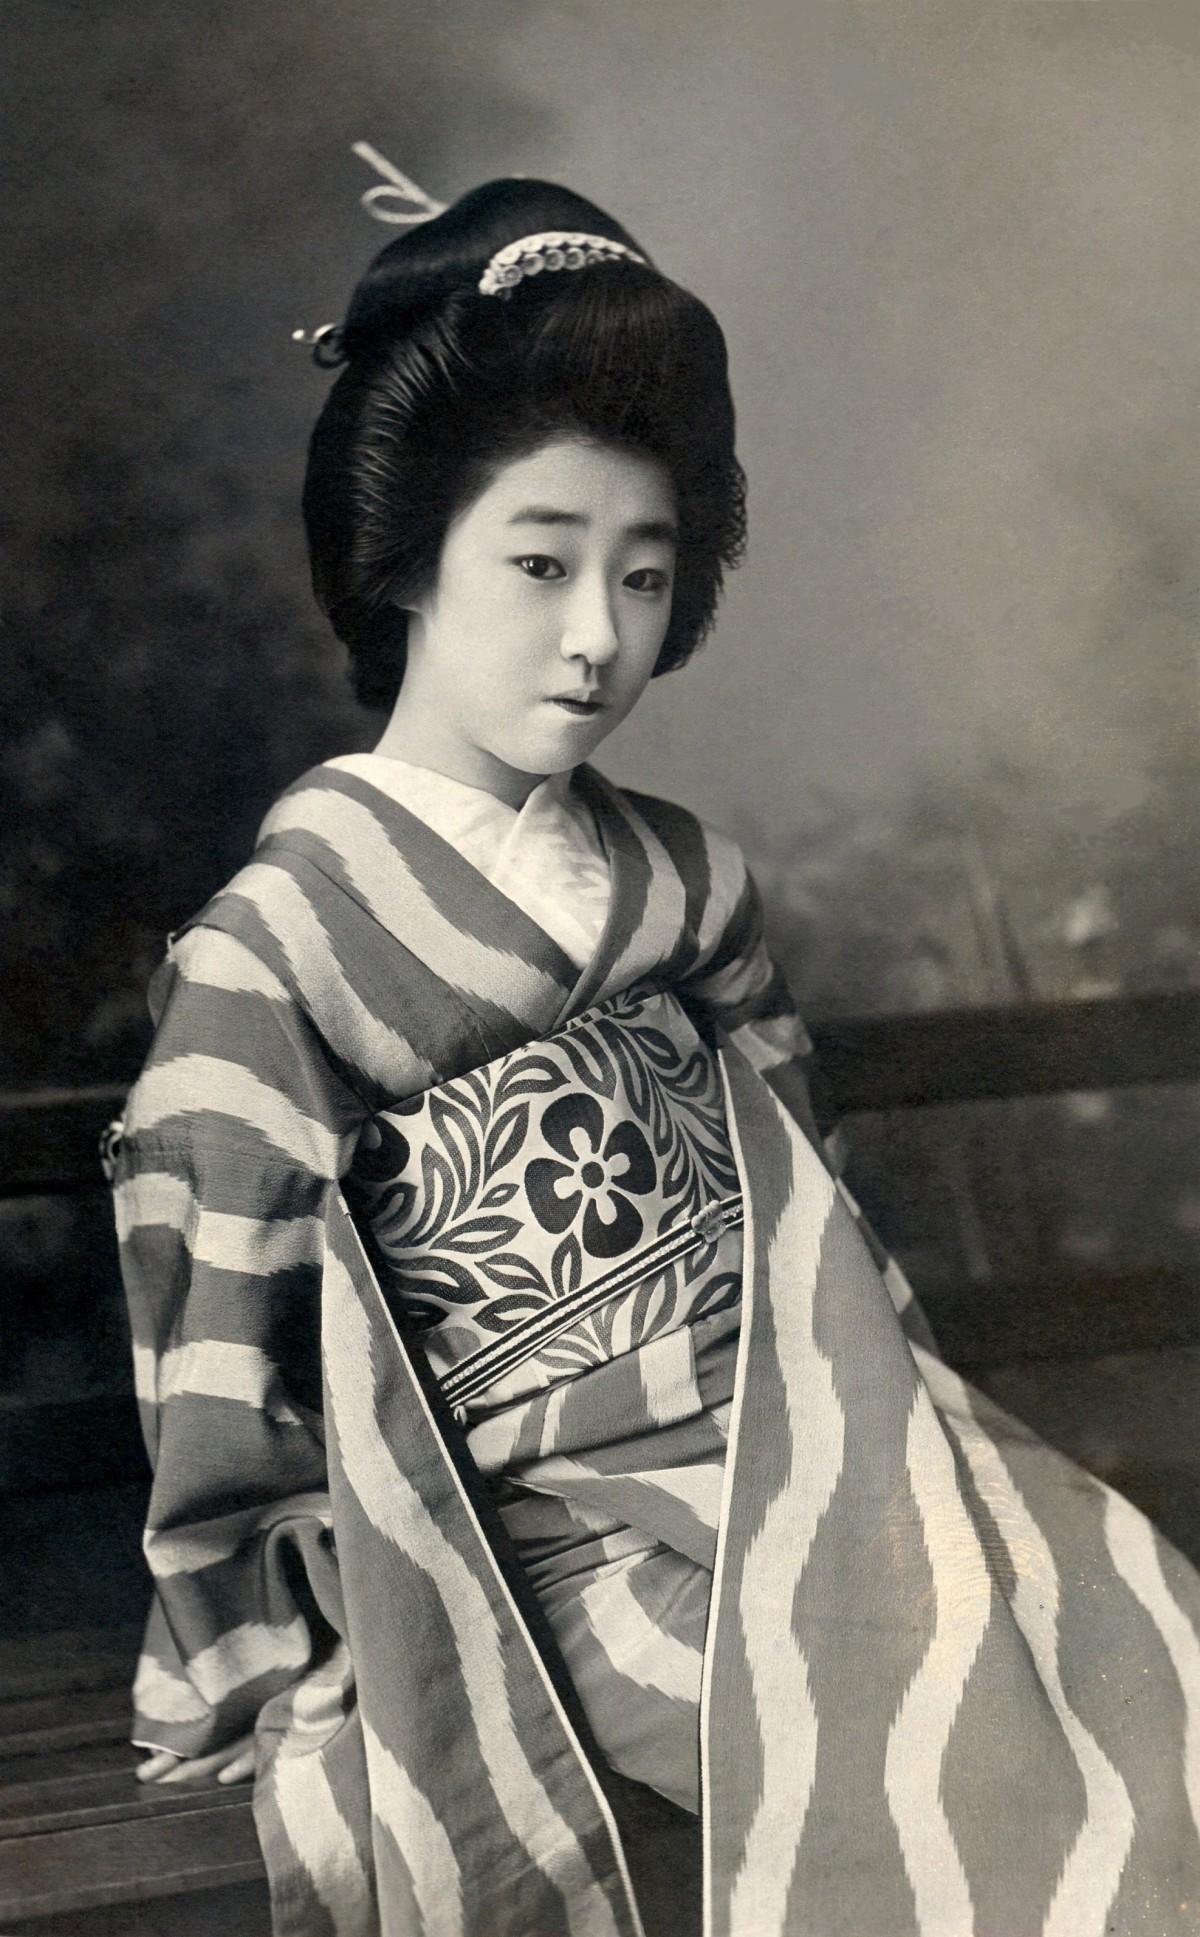 geisha_retro_vintage_japanese_asia-1335041.jpg!d